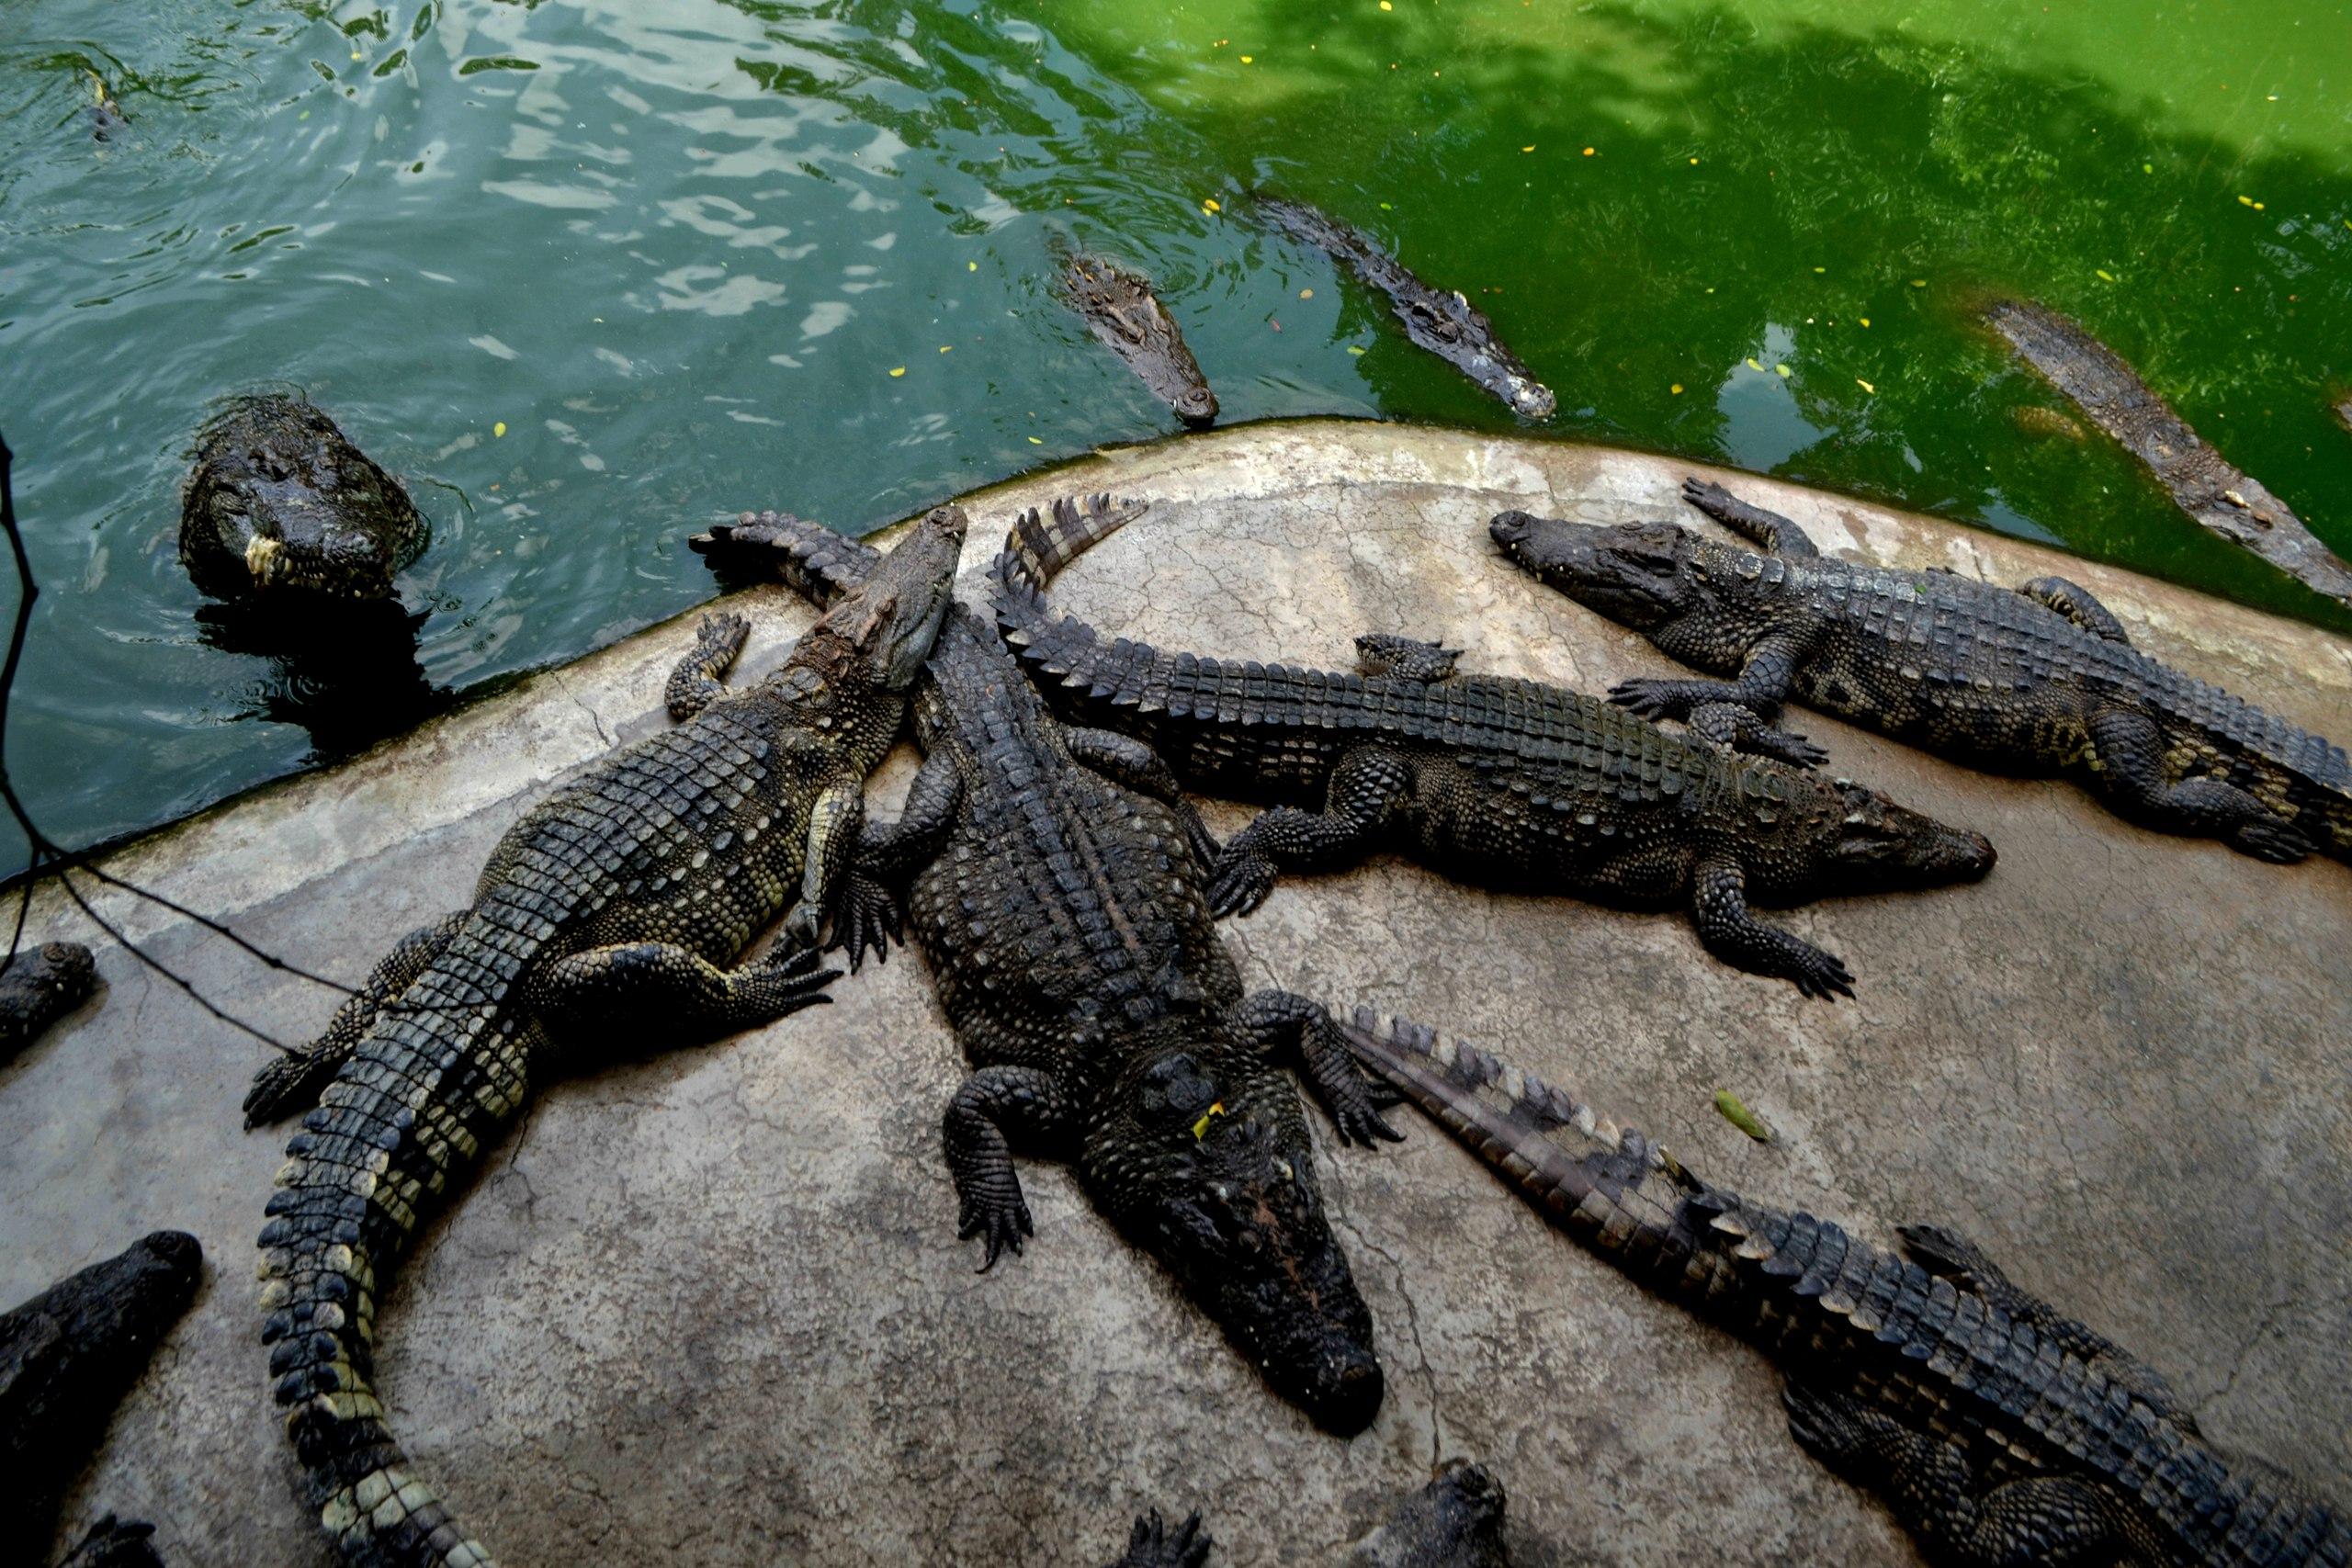 Елена Руденко ( Валтея ). Таиланд. Парк миллионолетних камней и крокодиловая ферма. - Страница 2 BYf3xY71k68